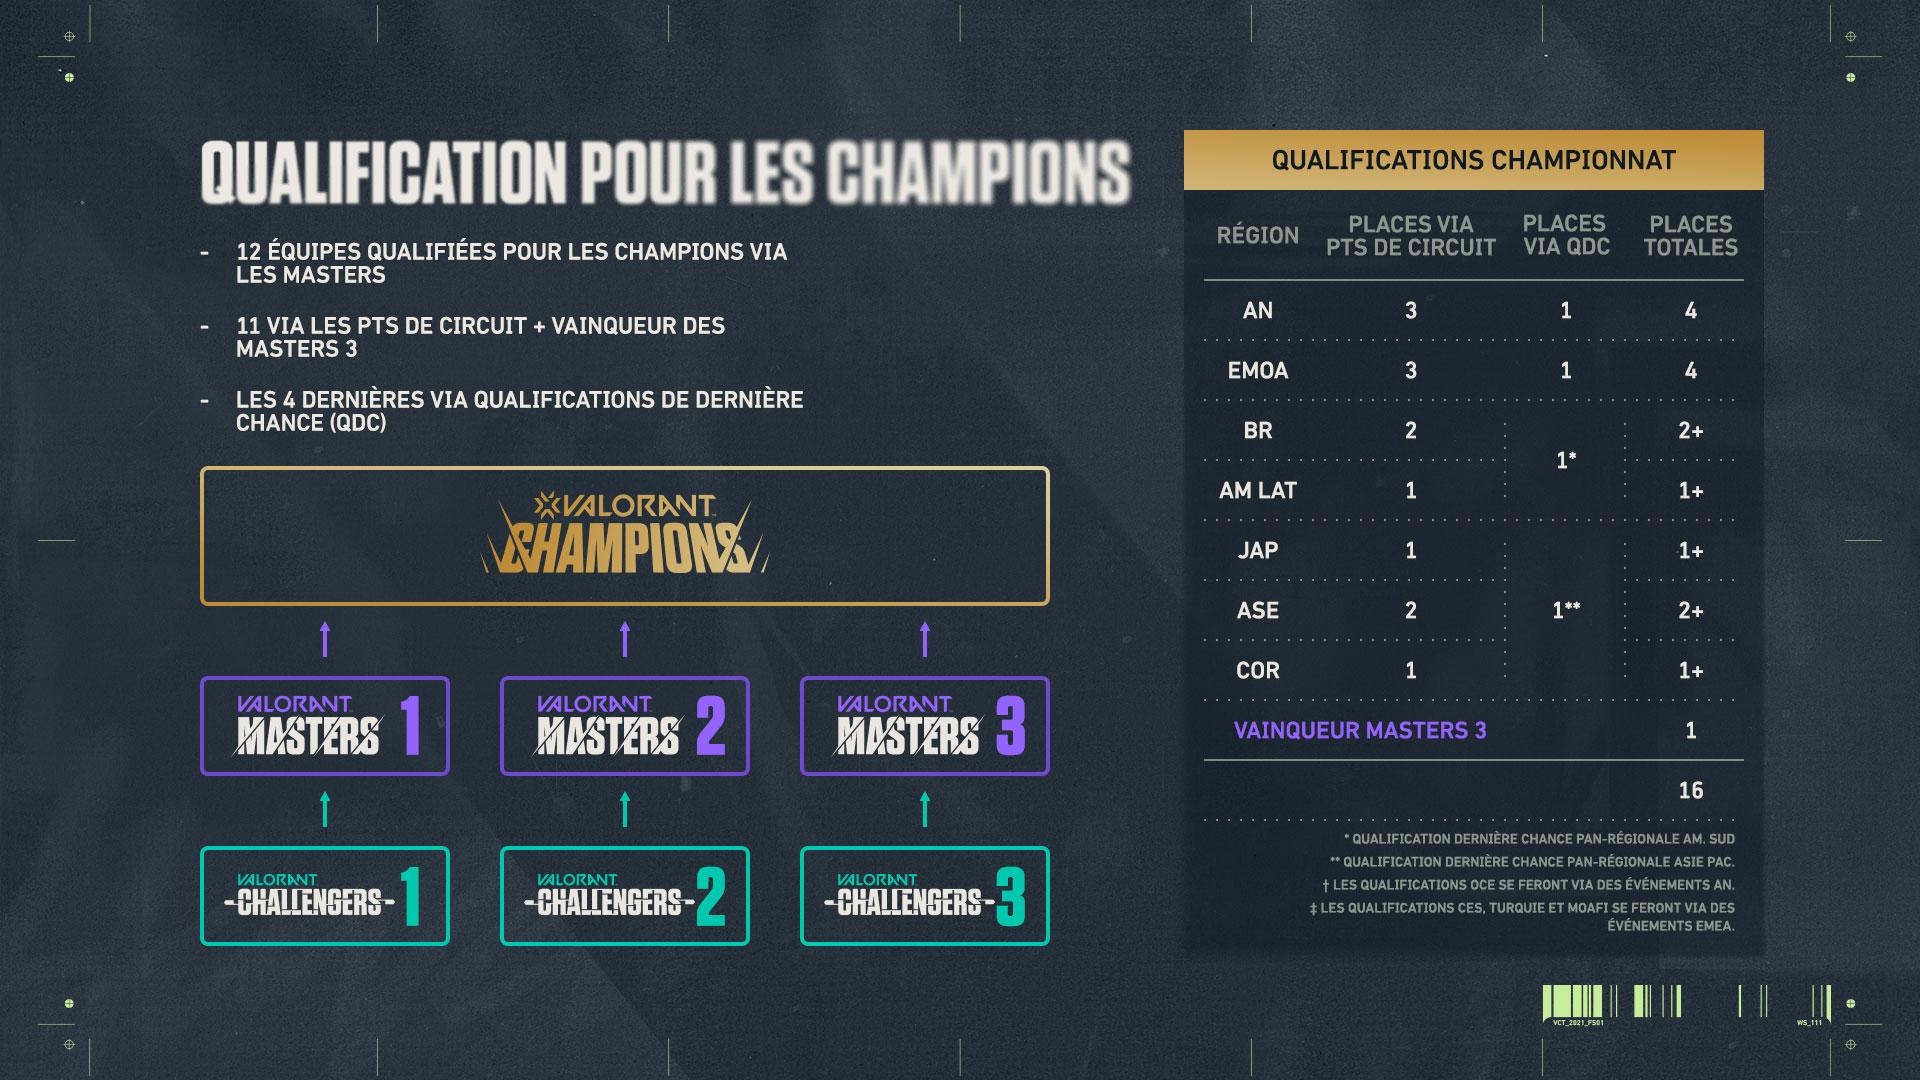 fr_fr_Copy-of-04-championsqualification-v1.0.jpg